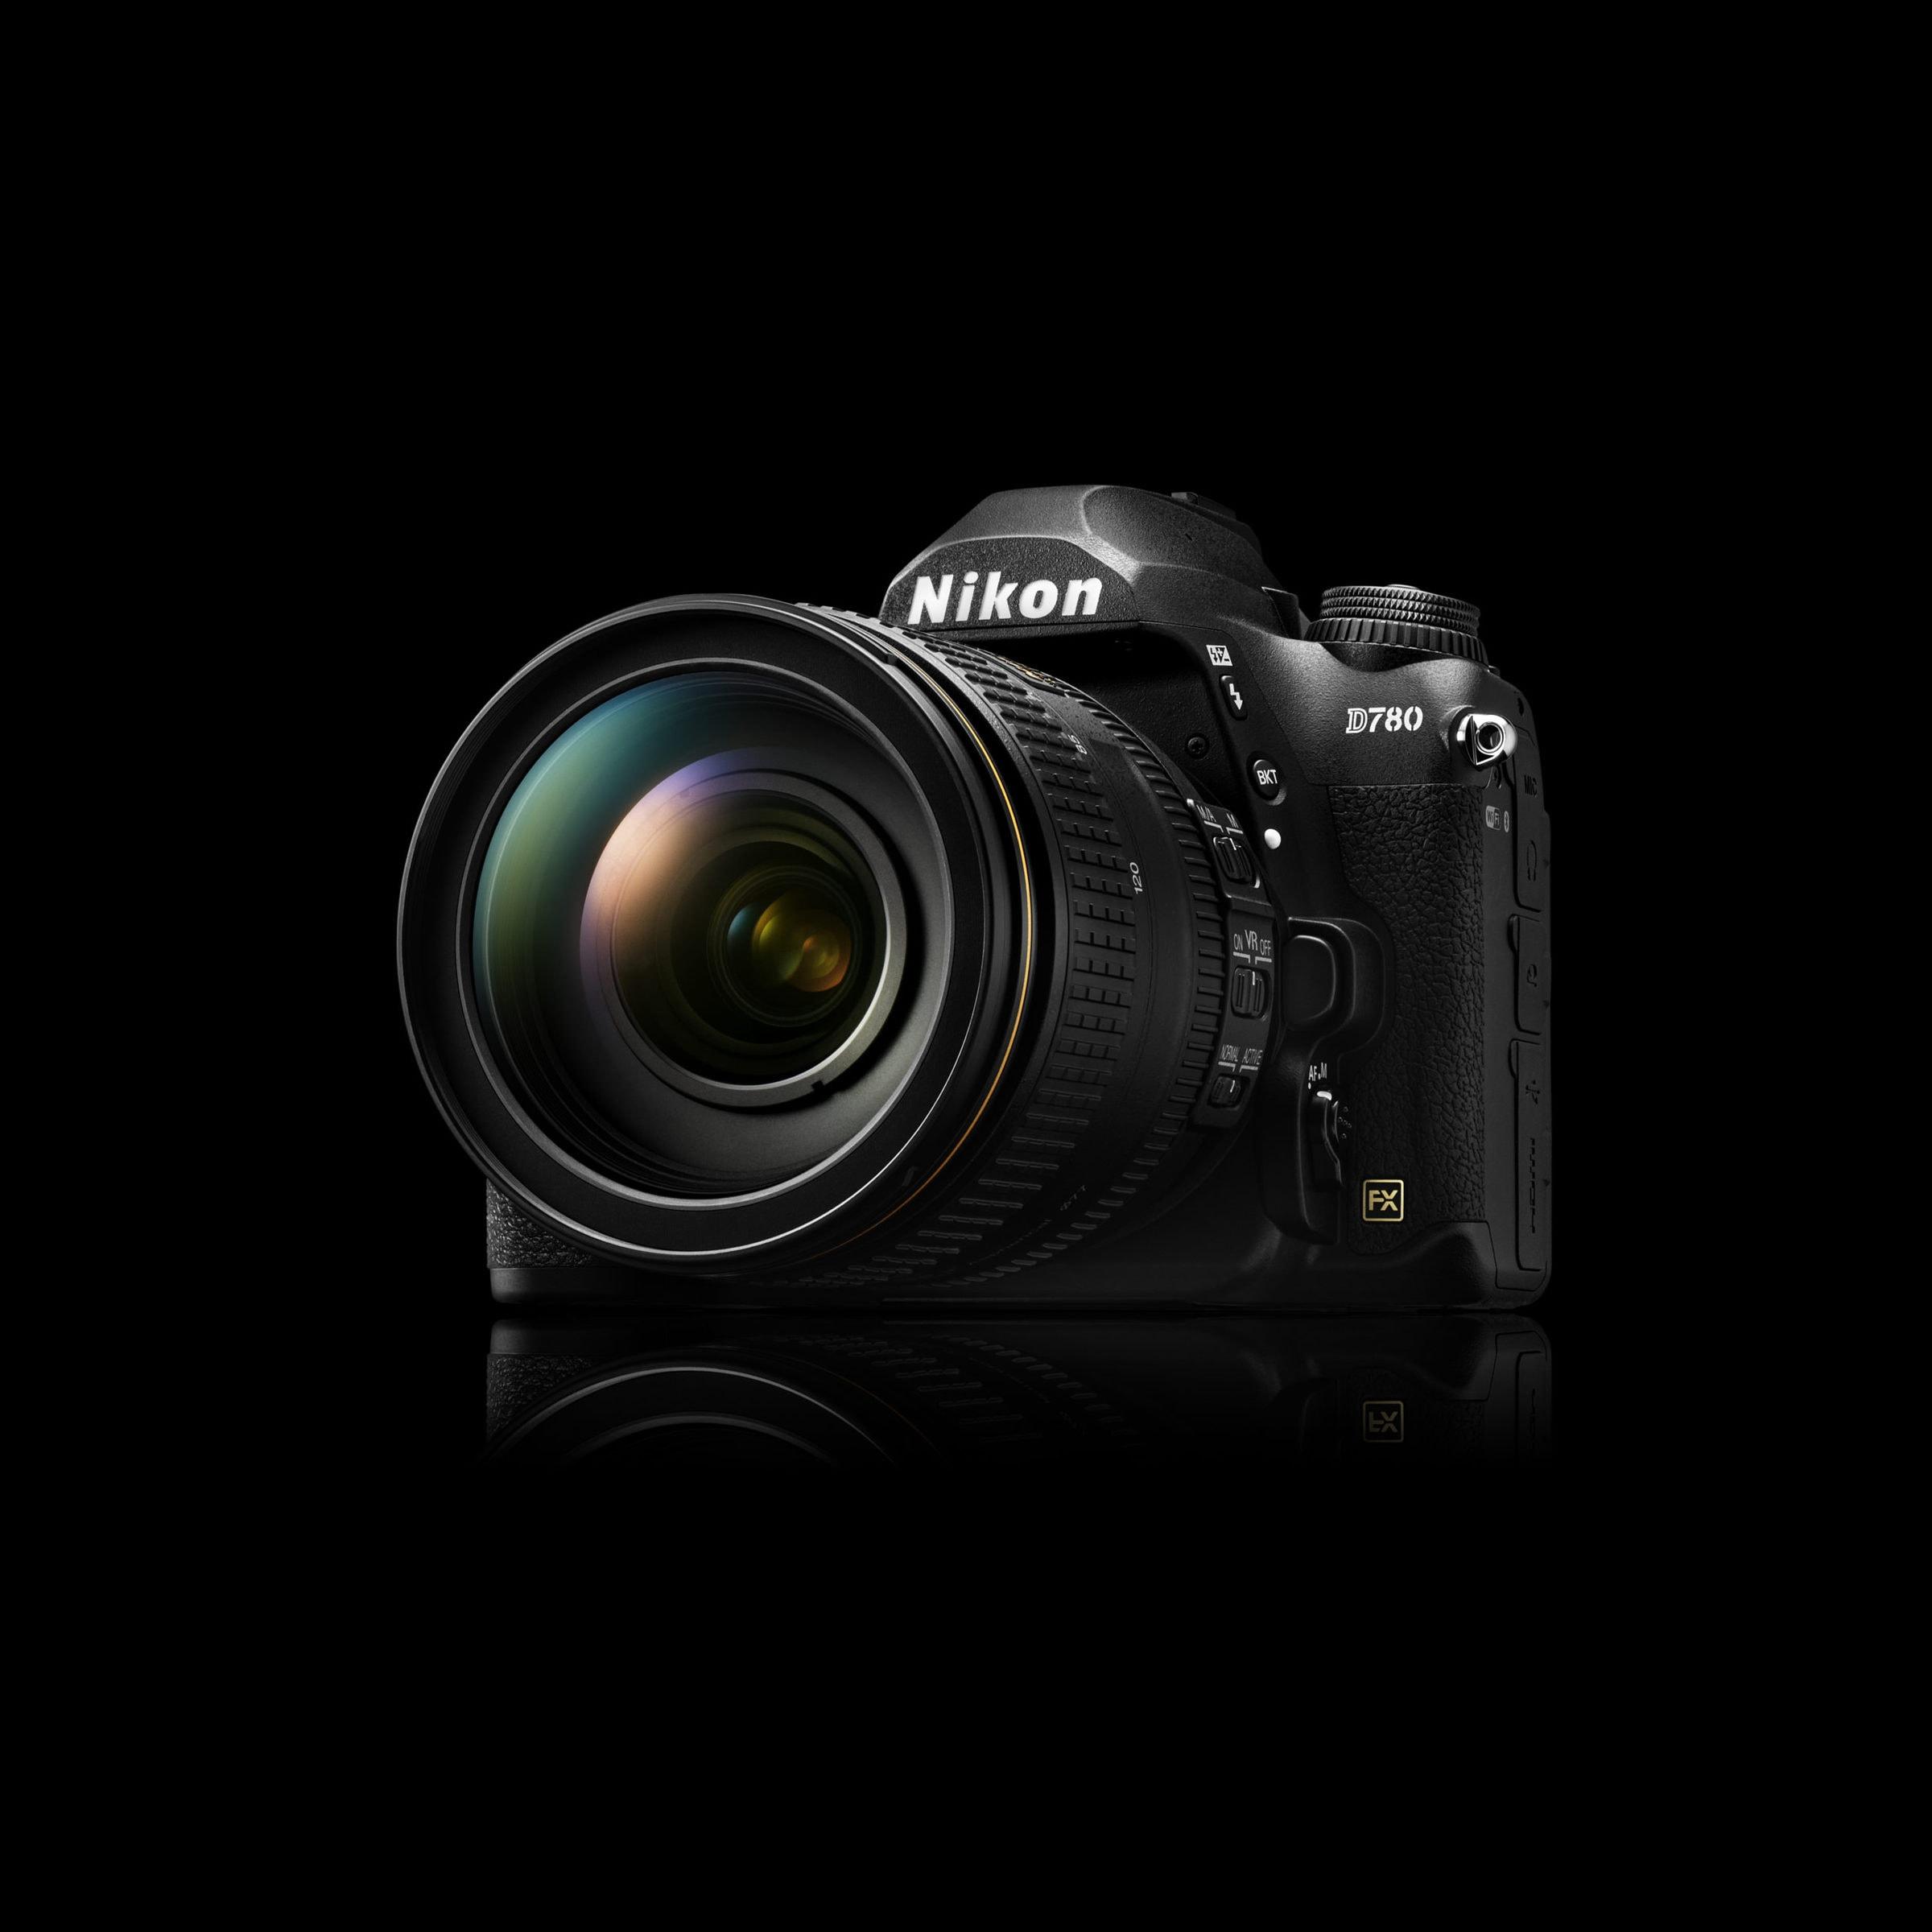 Nikon D780 | Quelle: Nikon GmbH